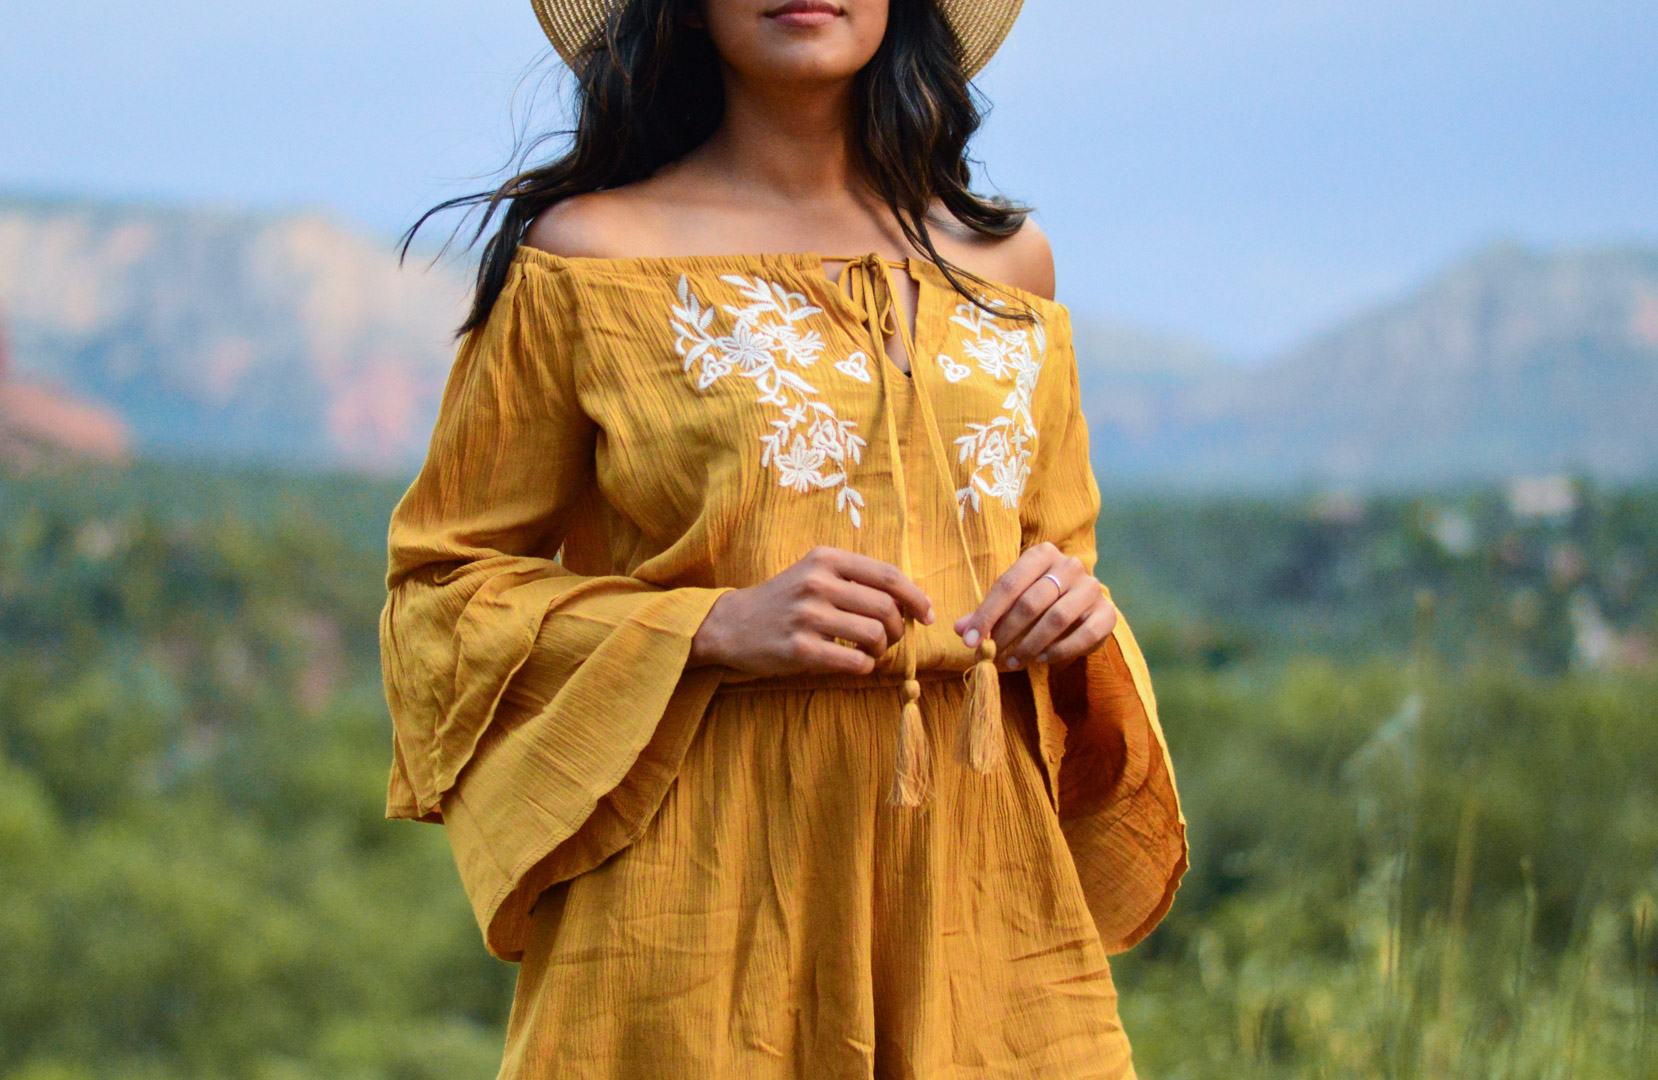 sedona-arizona-embroidered-marigold-romper-travel-blogger-outfit 6